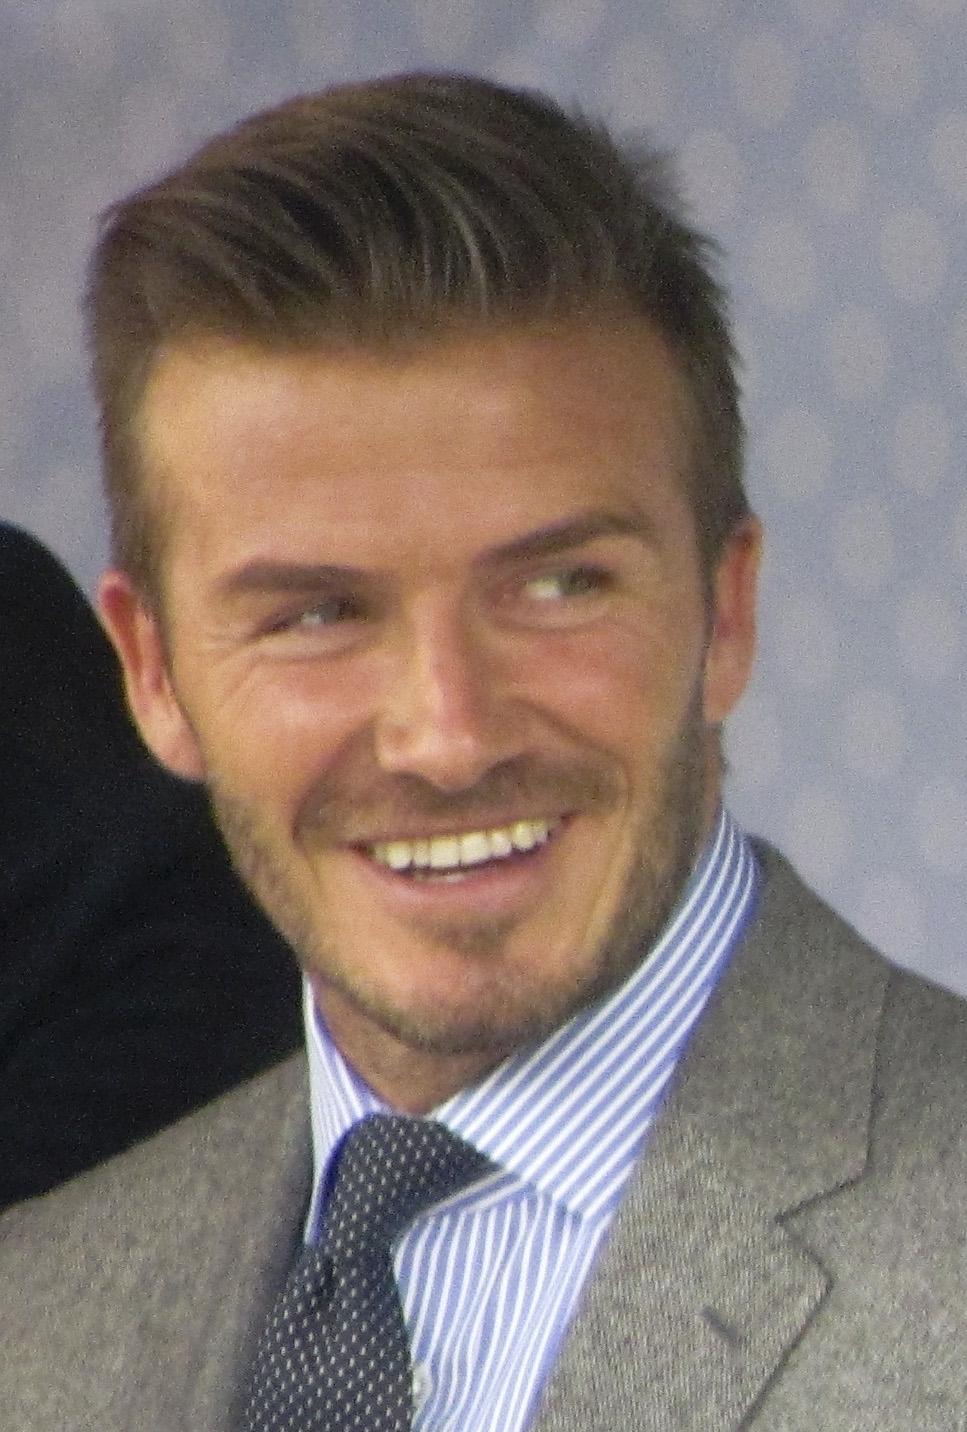 David_Beckham square face